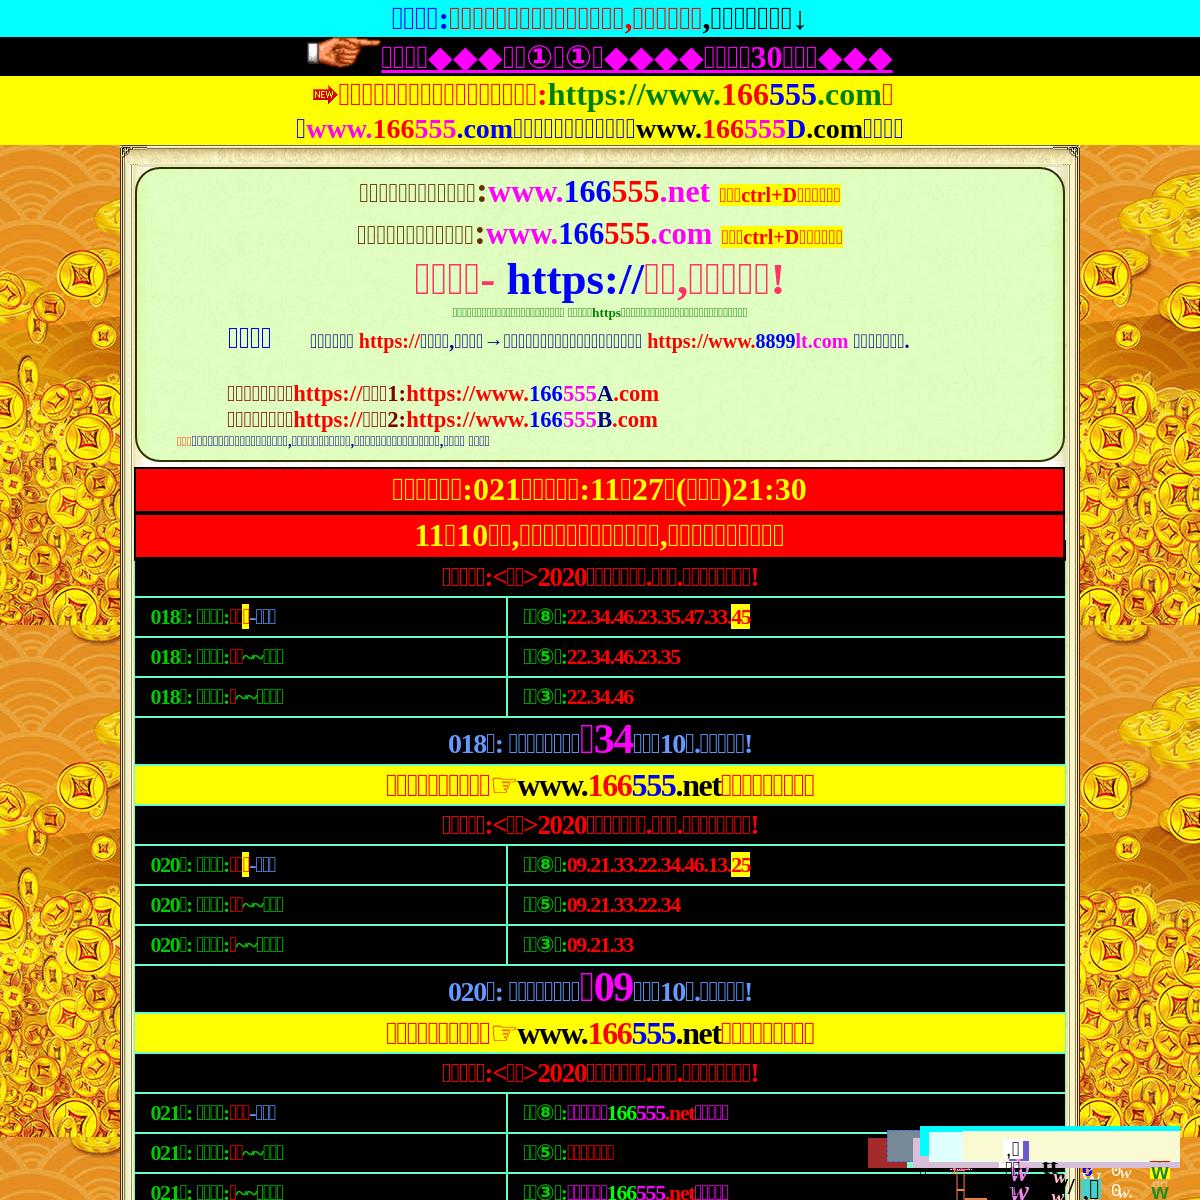 www.5908.com,铁算盘论坛,官家婆水心论坛四不像,19fcc香港彩富网网站,喜中网4969cc网站,49727.com,www.90211